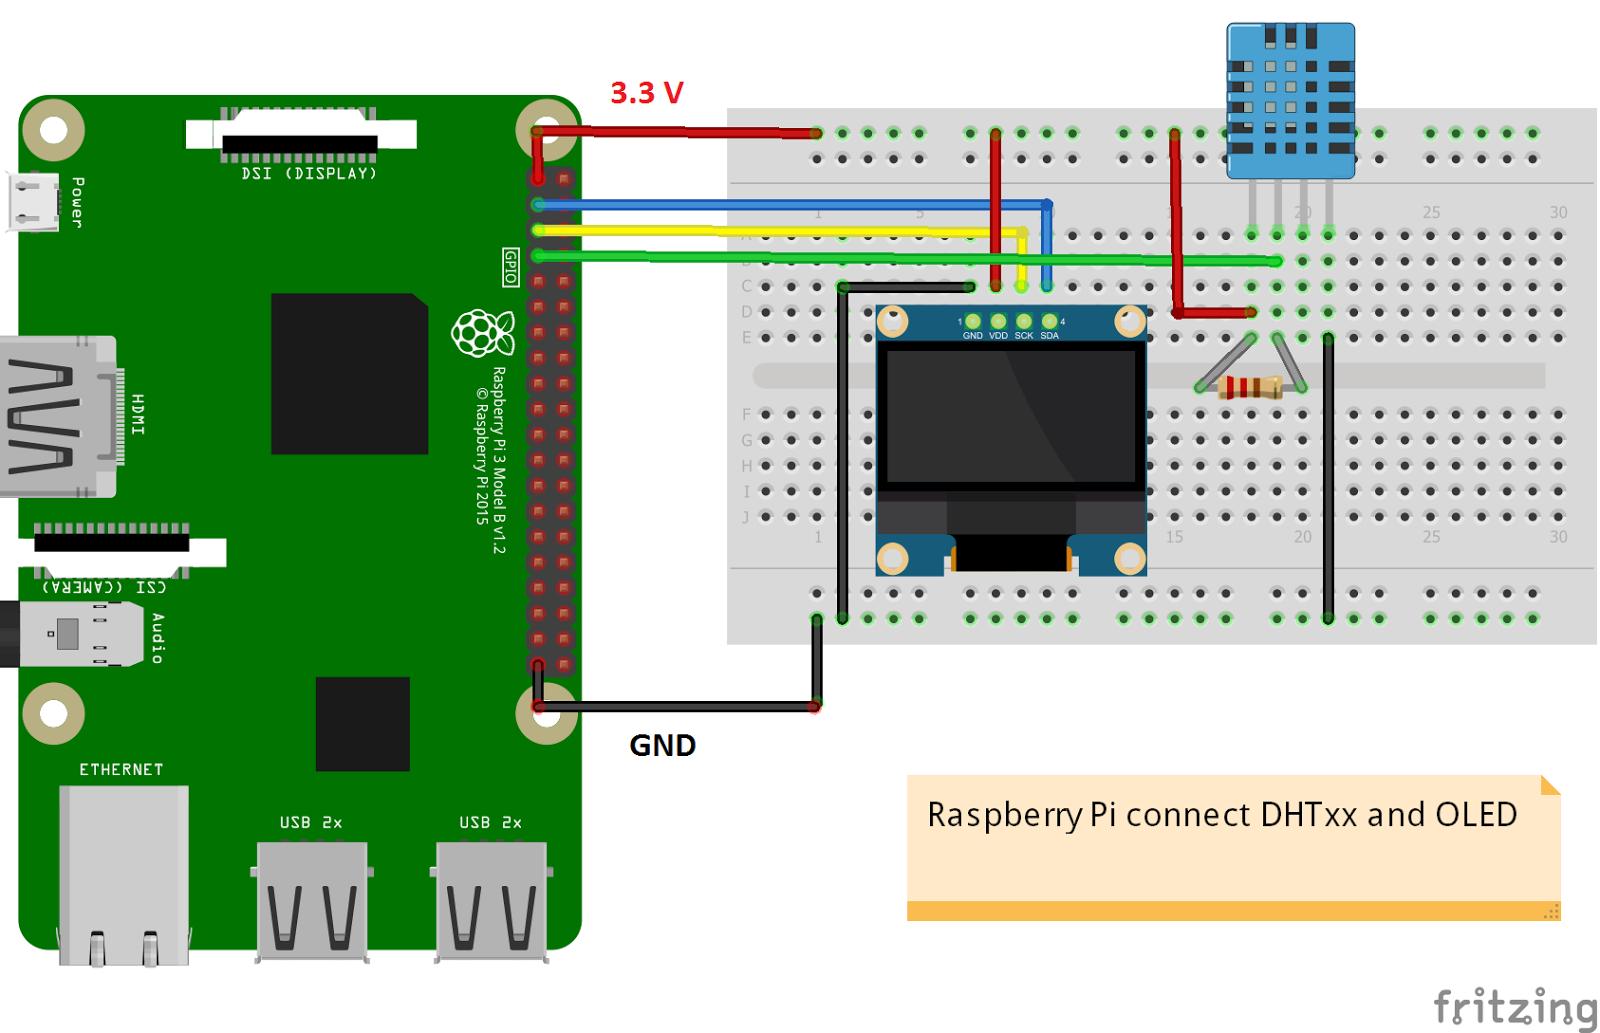 Swell Raspberry Pi Projects Raspberry Pi Dht Sensor And Oled In Python Code Wiring Database Ilarigelartorg